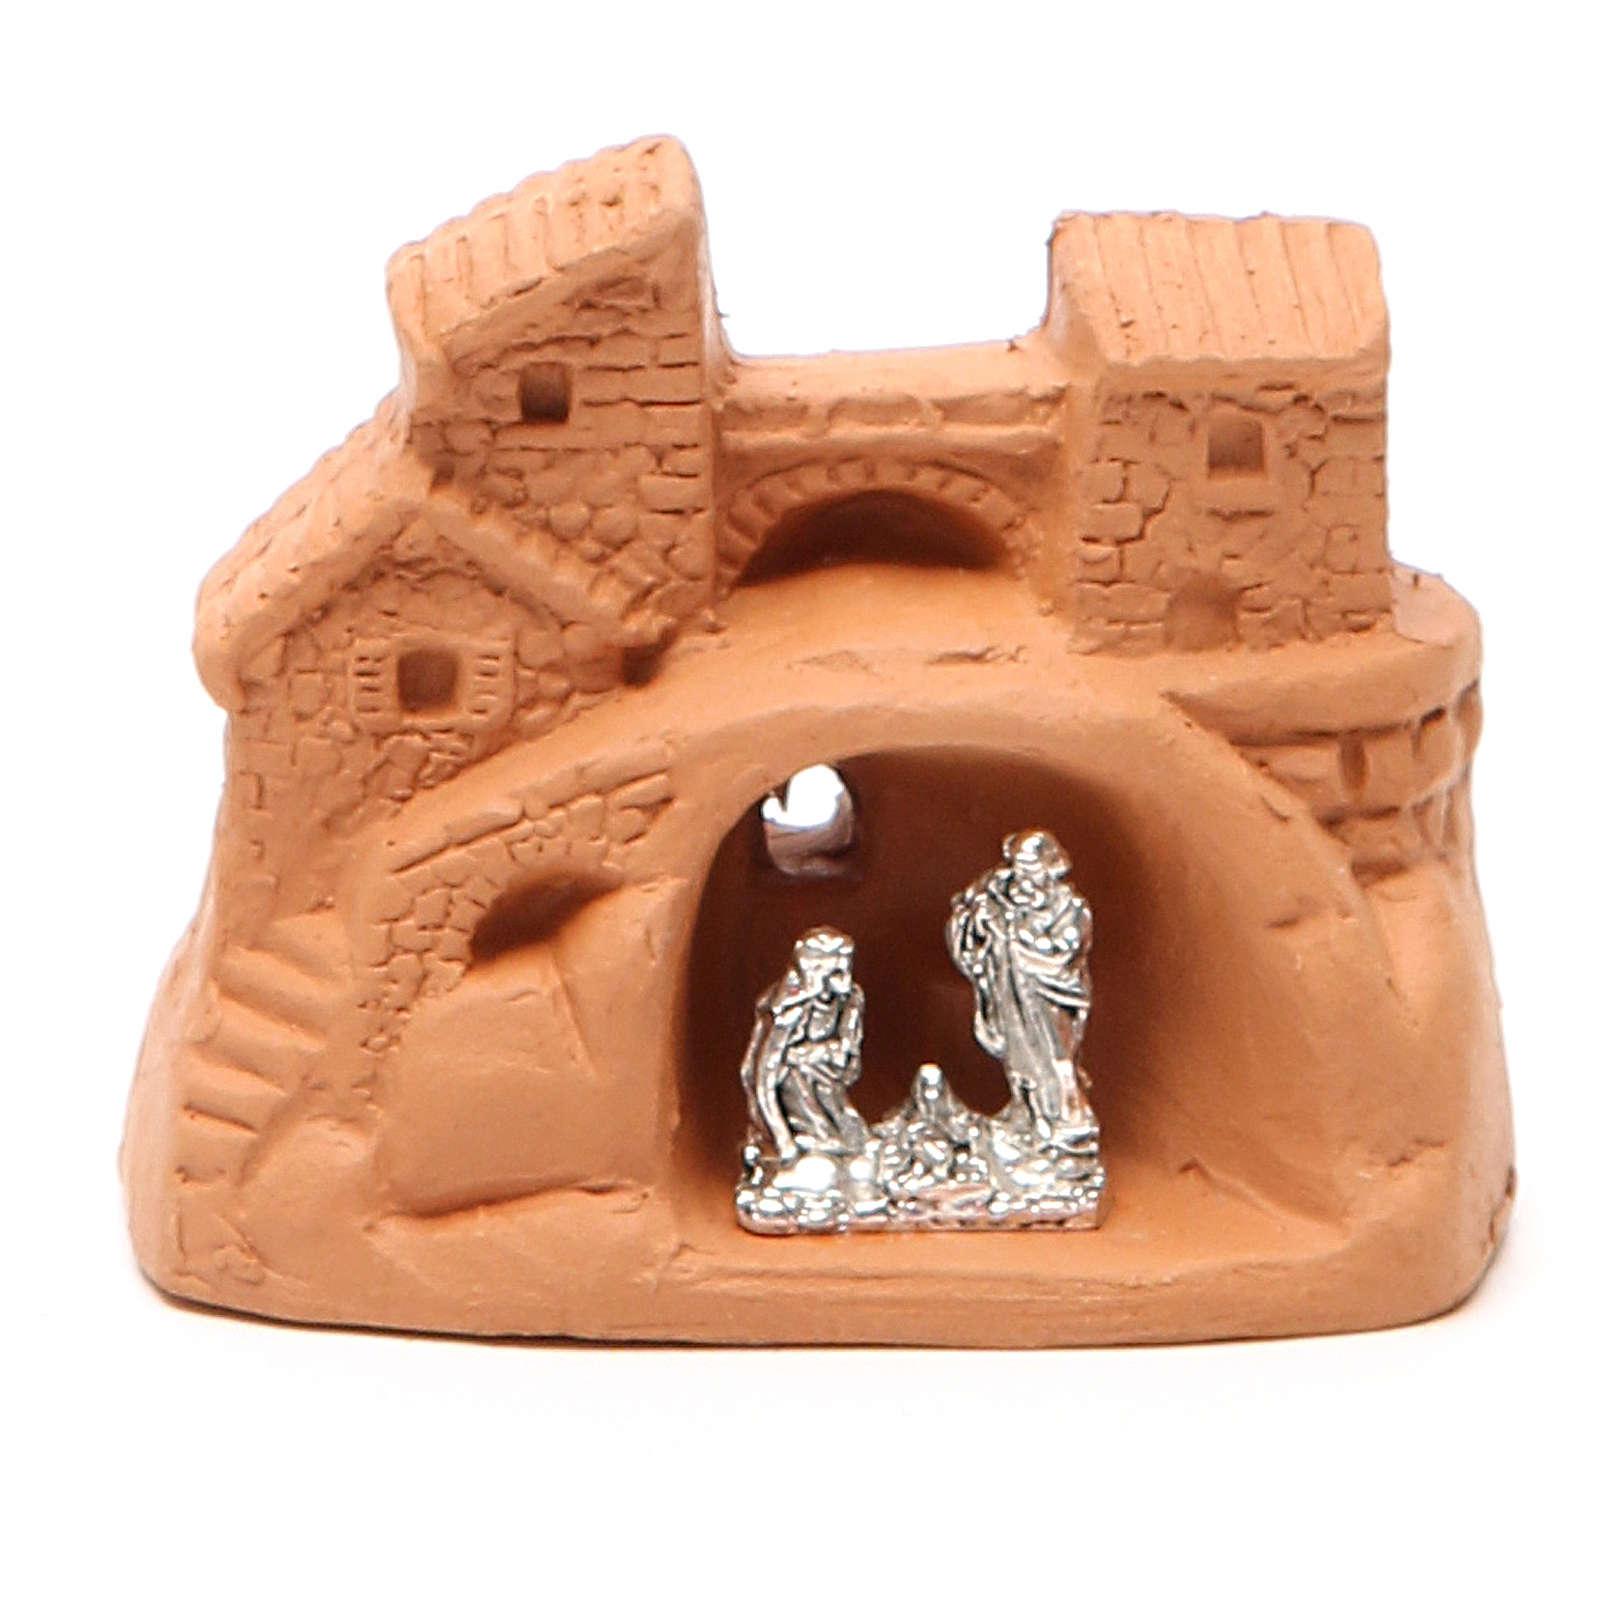 Mini Heilige Familie Terrakotta und Metall 6x7x4cm 4